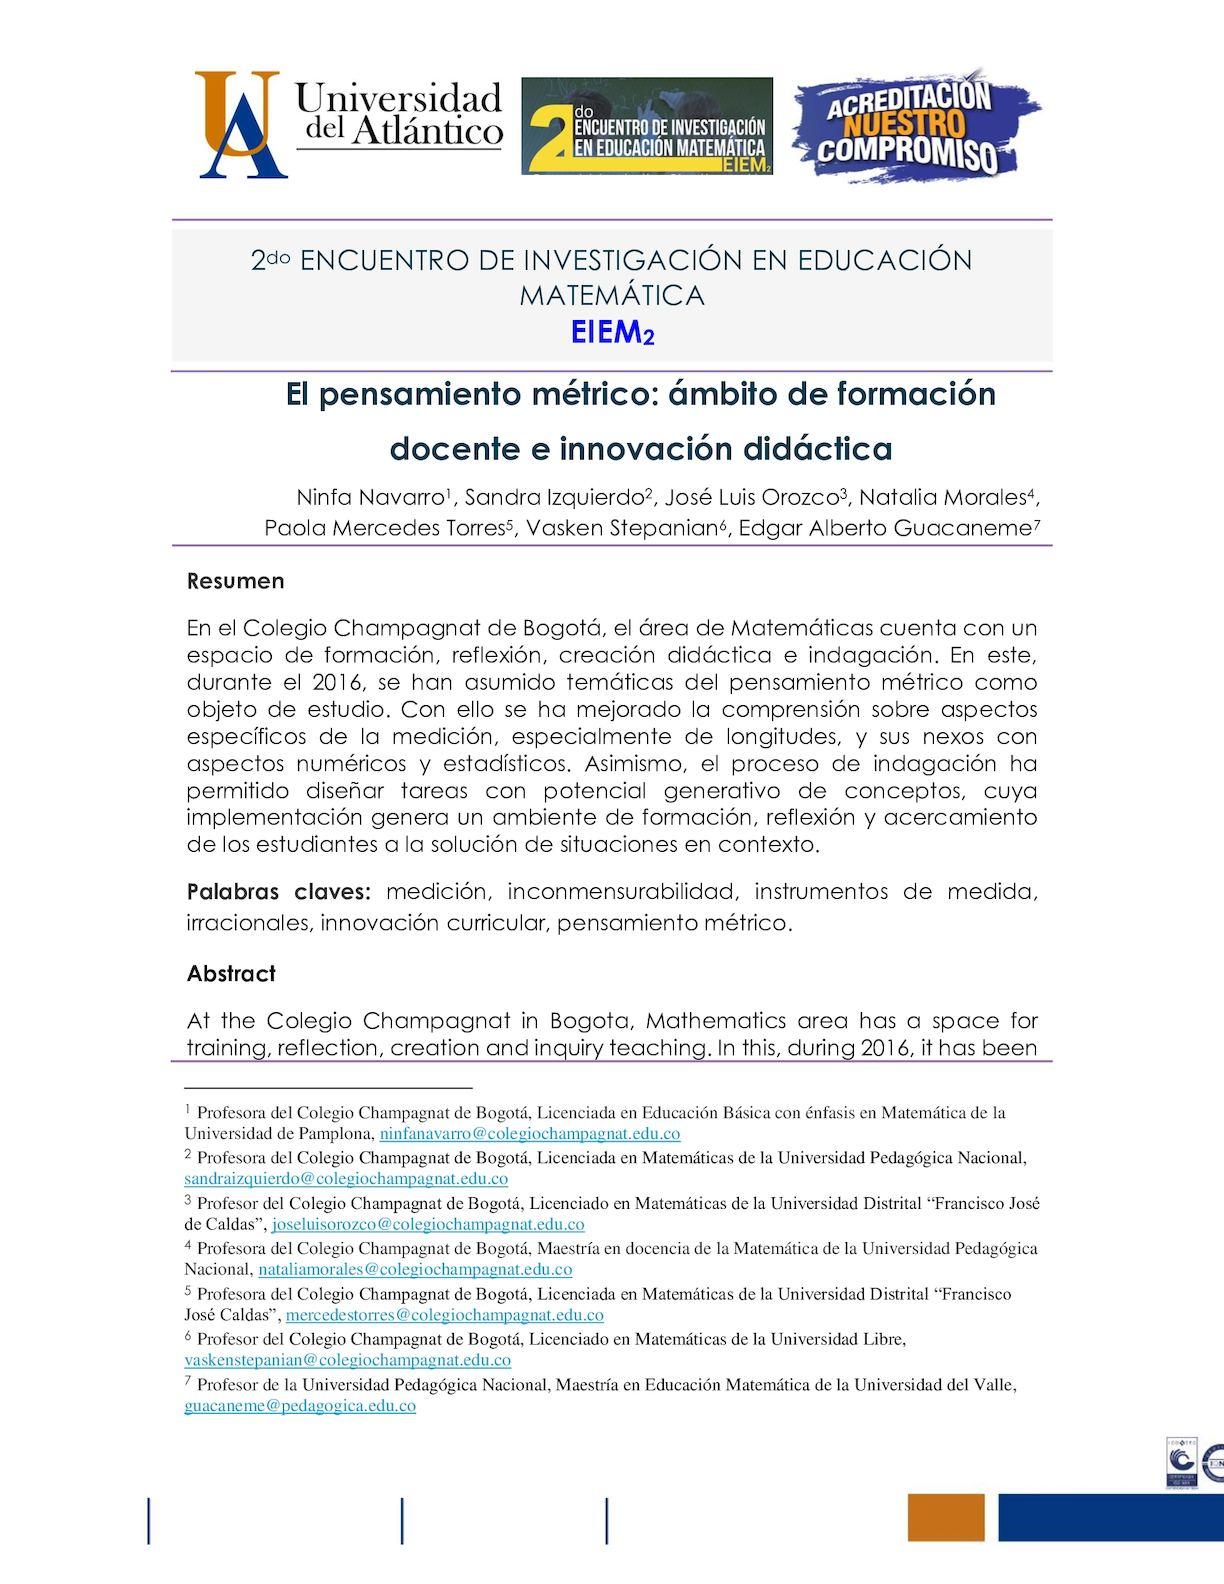 Calaméo - CB Navarro Et Al Pensamiento Métrico(documento Extenso).